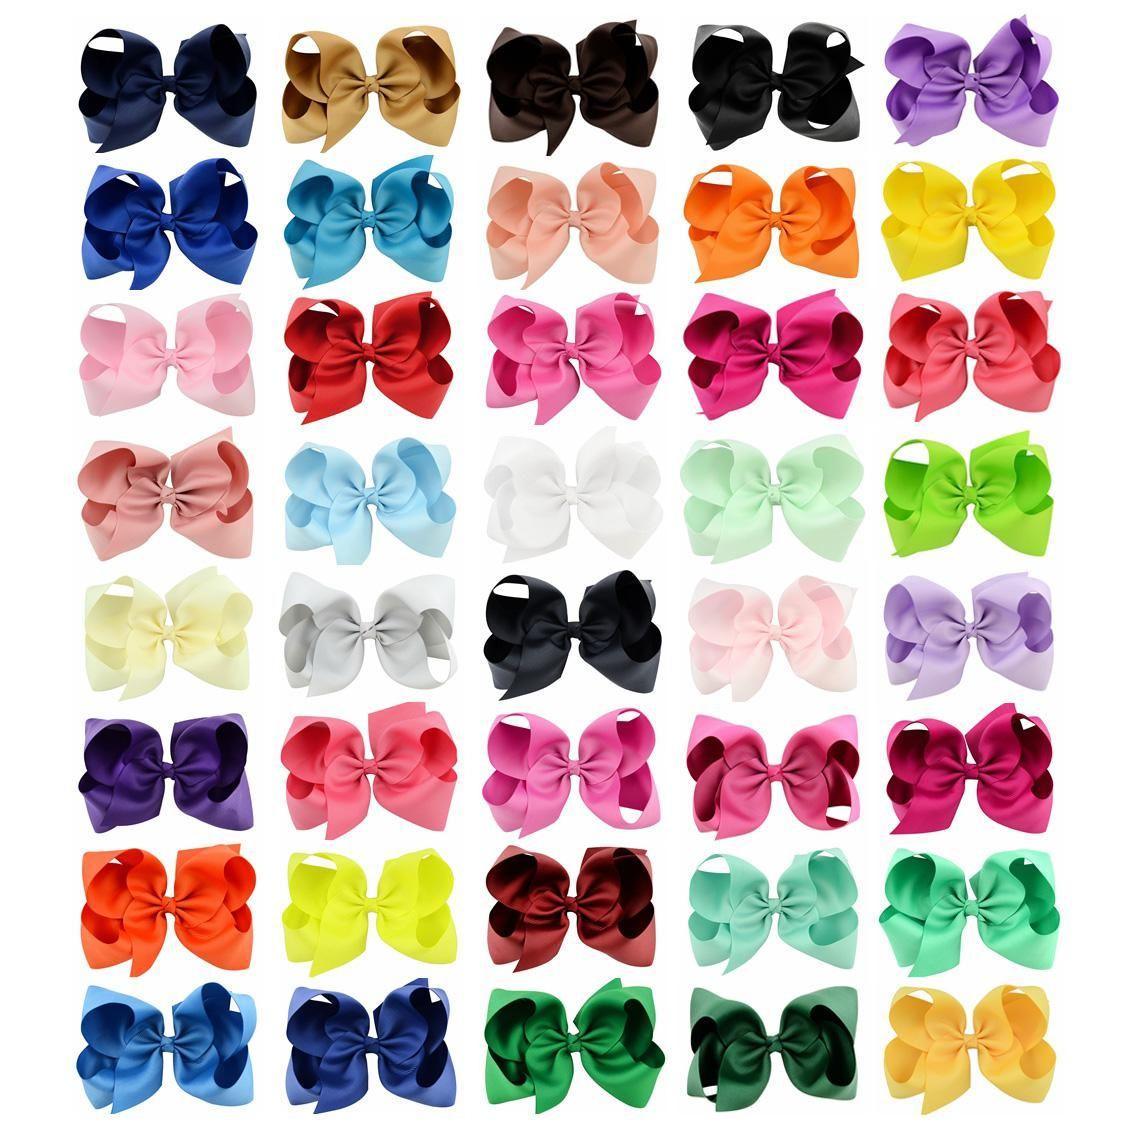 6 zoll mode baby ribbon bogen haarnadelclips mädchen große bowknot barrette kinder haar boutique bögen kinder haarschmuck ewc3891